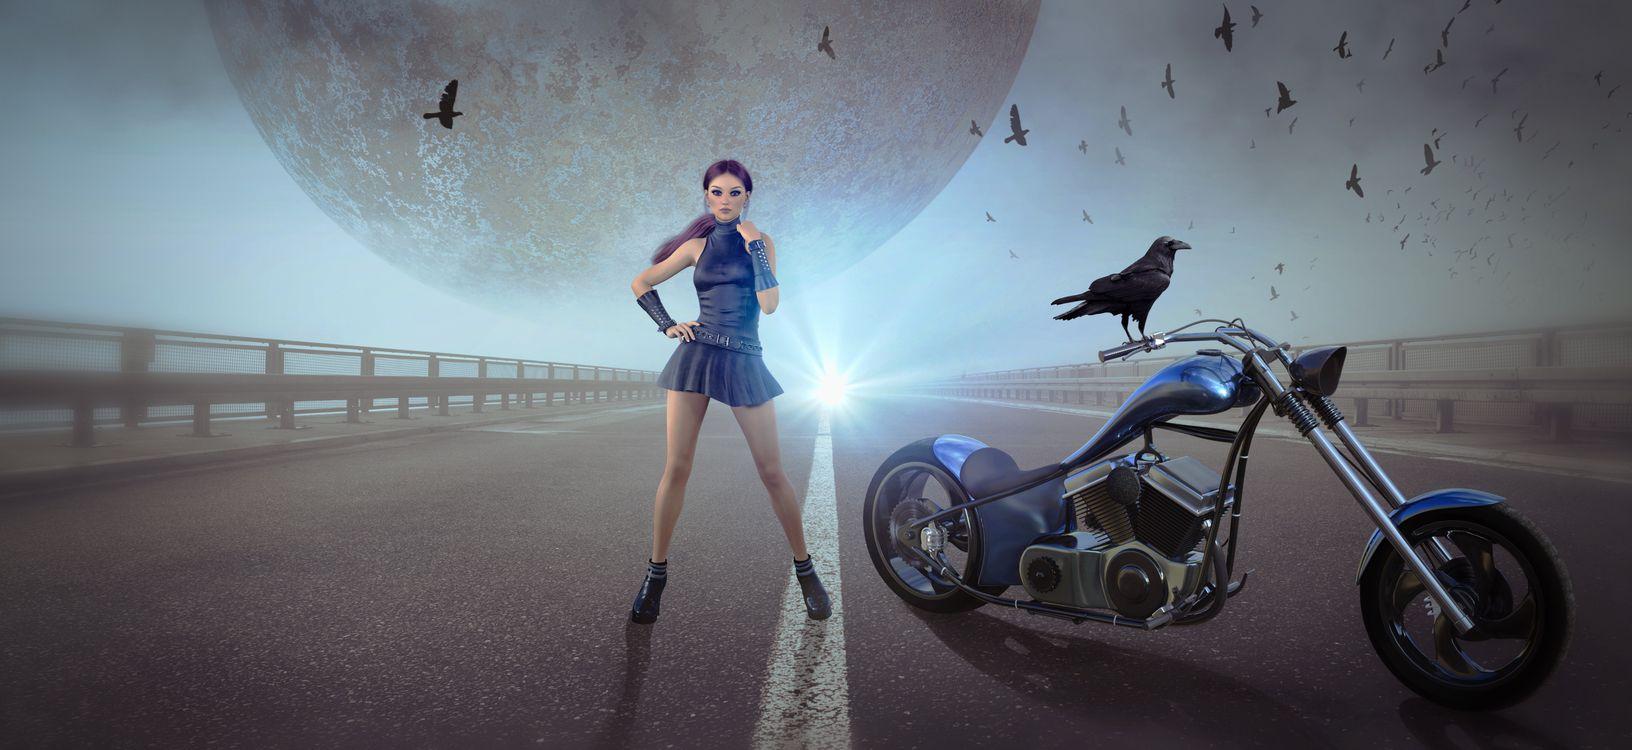 Фото бесплатно фантазии, мотоцикл, женщина - на рабочий стол